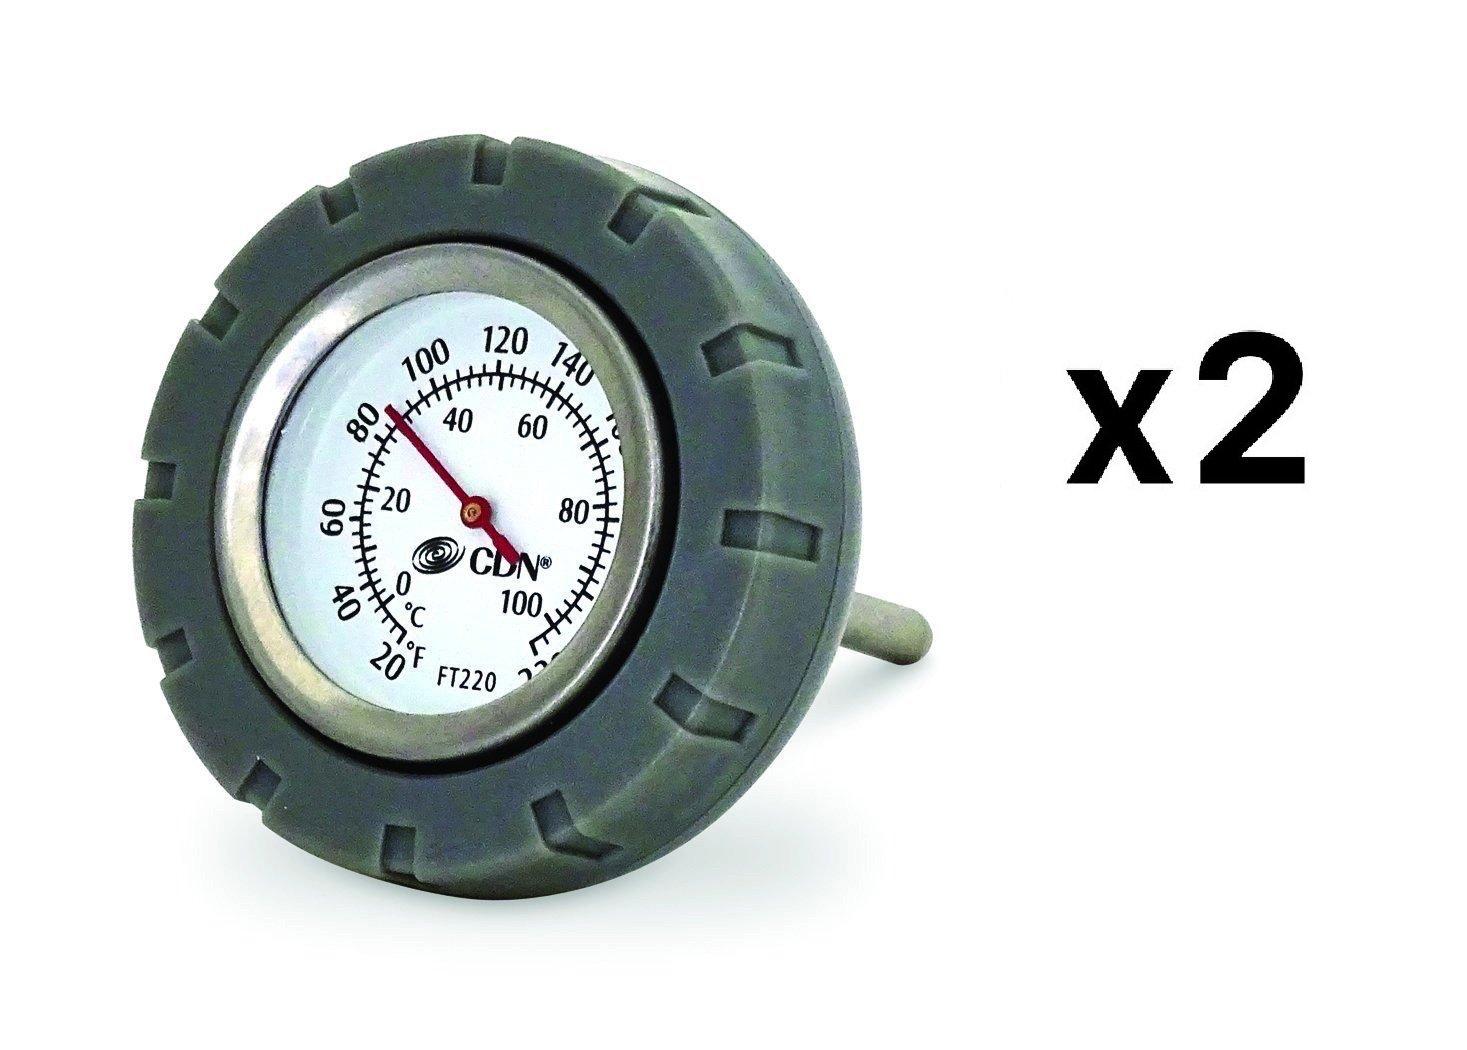 CDN Multi-Purpose Floating Waterproof Stainless Steel Thermometer Sauce (2-Pack)